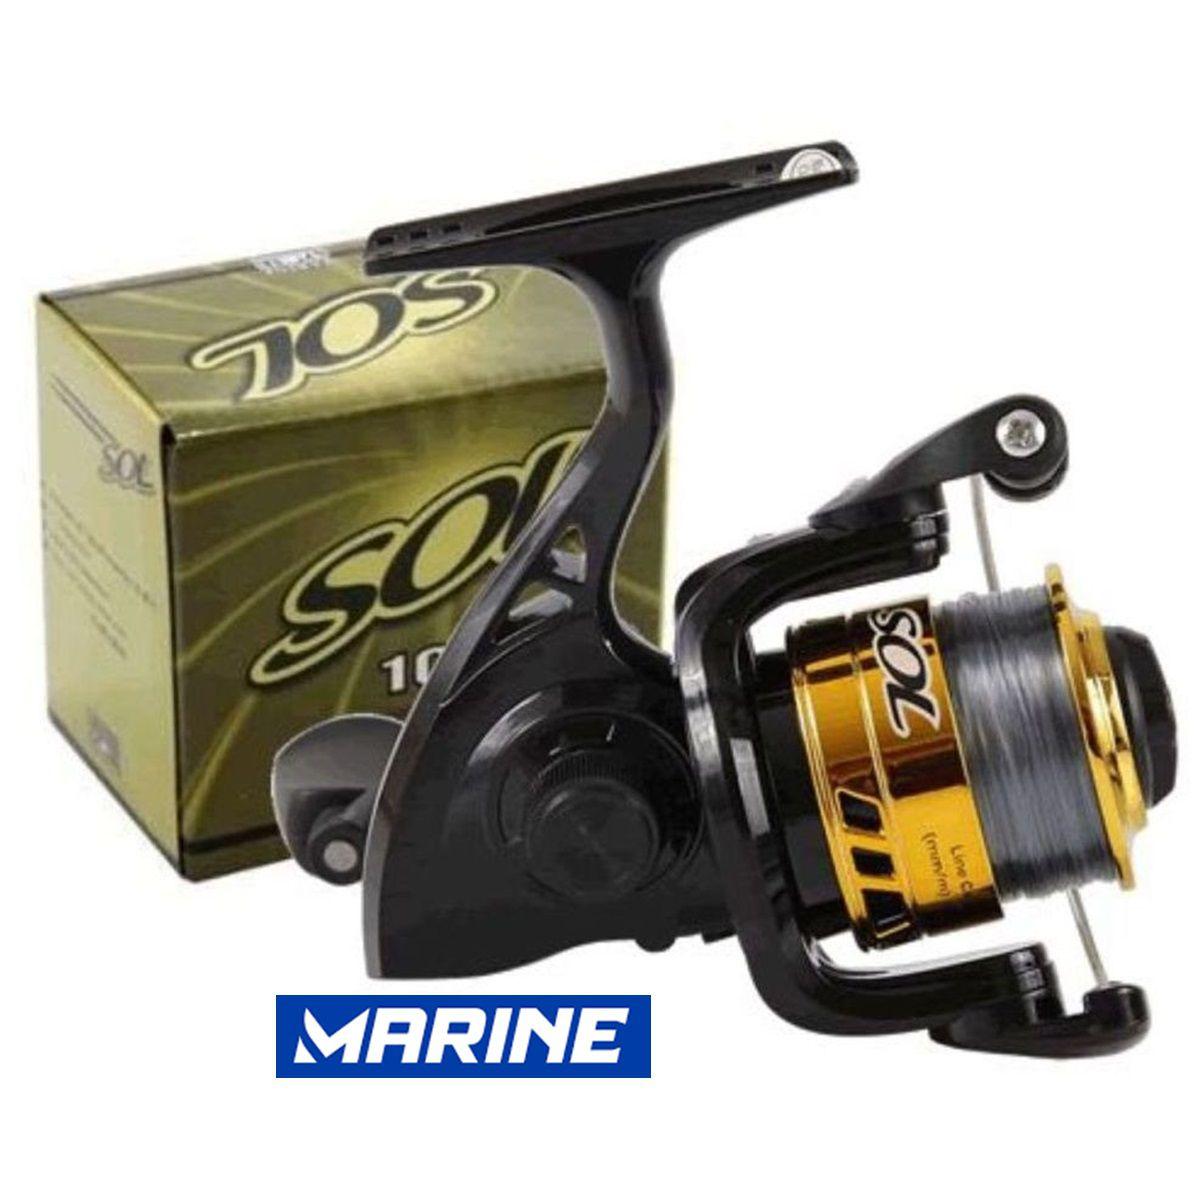 Conjunto De Pesca Completo 2 Vara 1,35 2 Molinete Itens